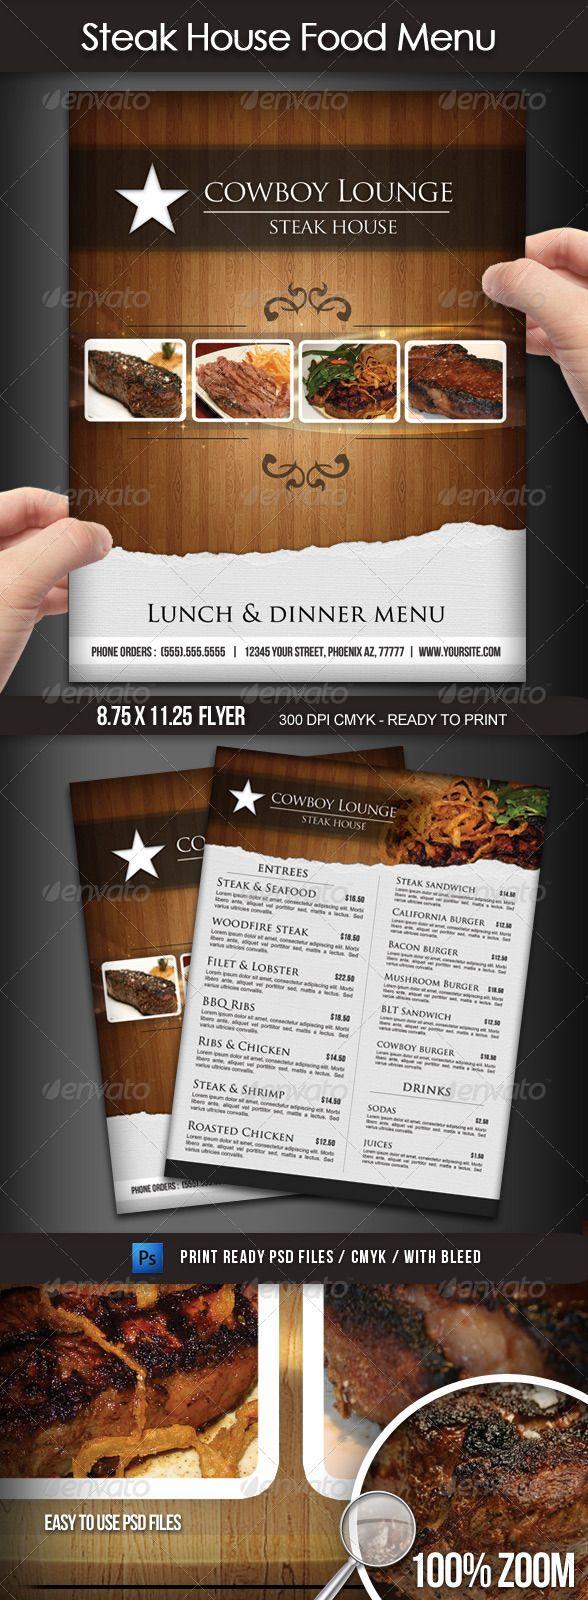 Steak House Menu Flyer #elegant restaurant menu #8.5x11 #PSD • Click here to download ! http://graphicriver.net/item/steak-house-menu-flyer/1721529?s_rank=119&ref=pxcr